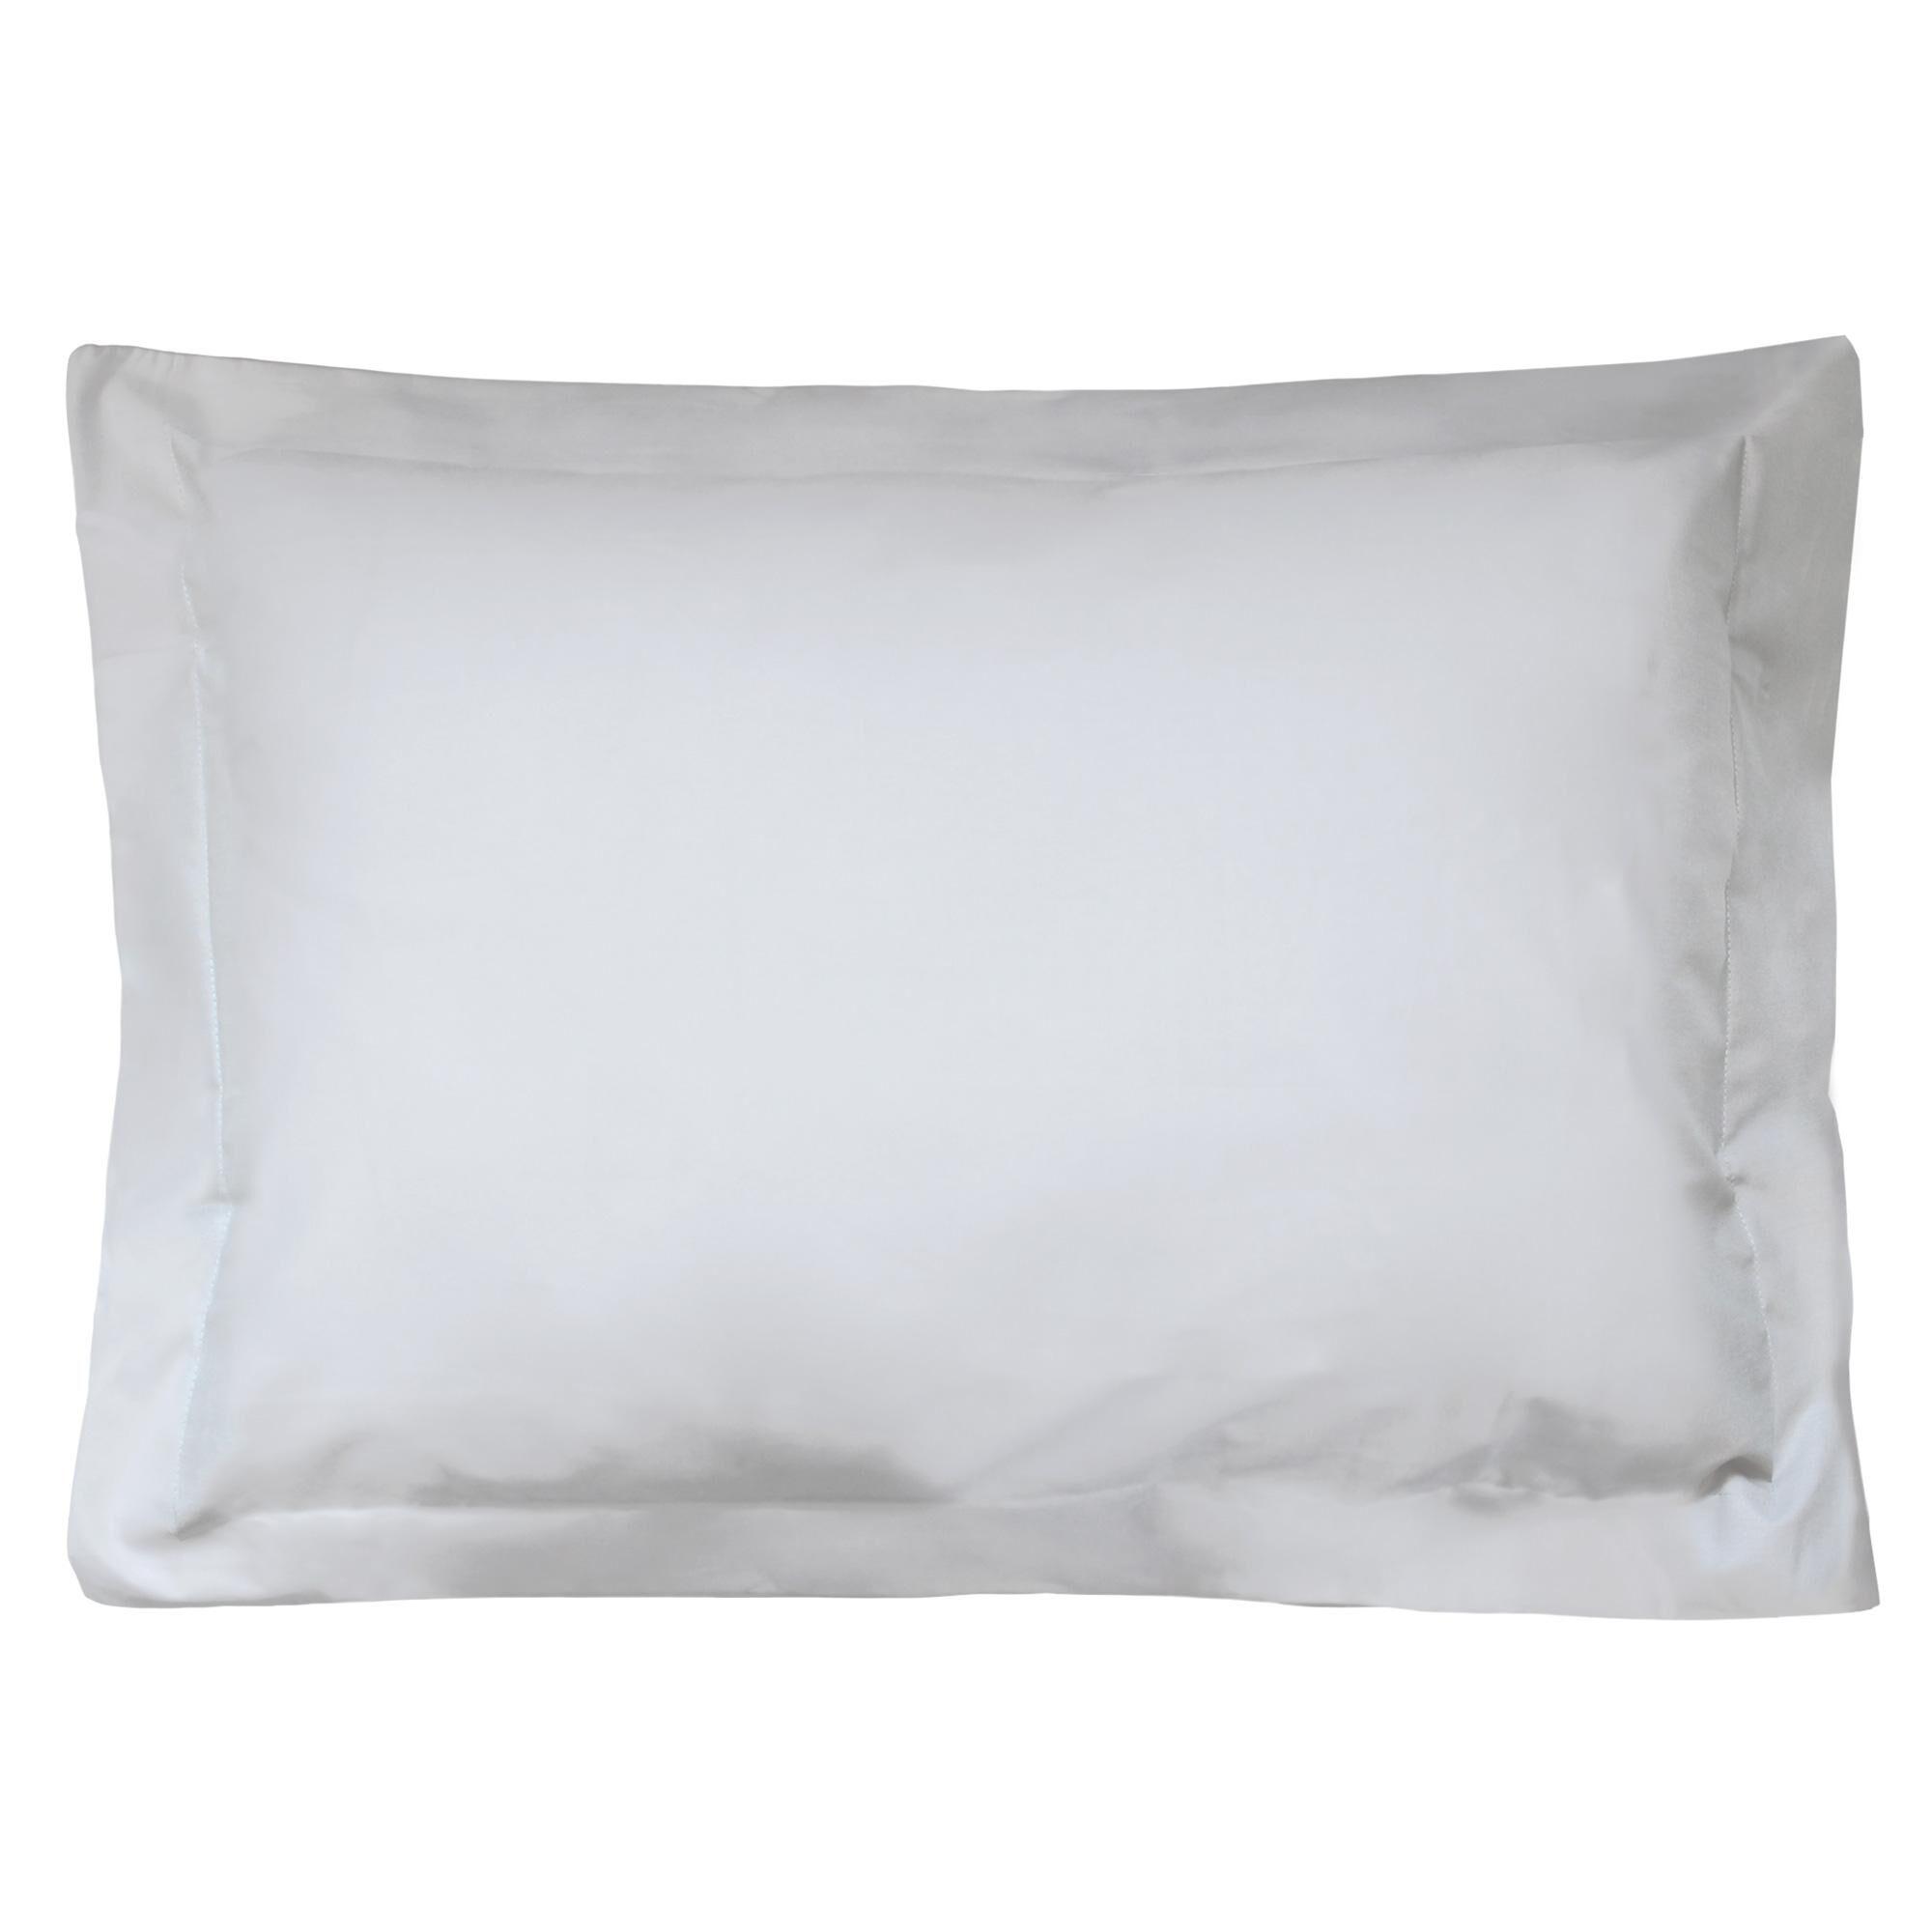 Linnea Taie d'oreiller uni 70x50 cm 100% coton ALTO Calcium